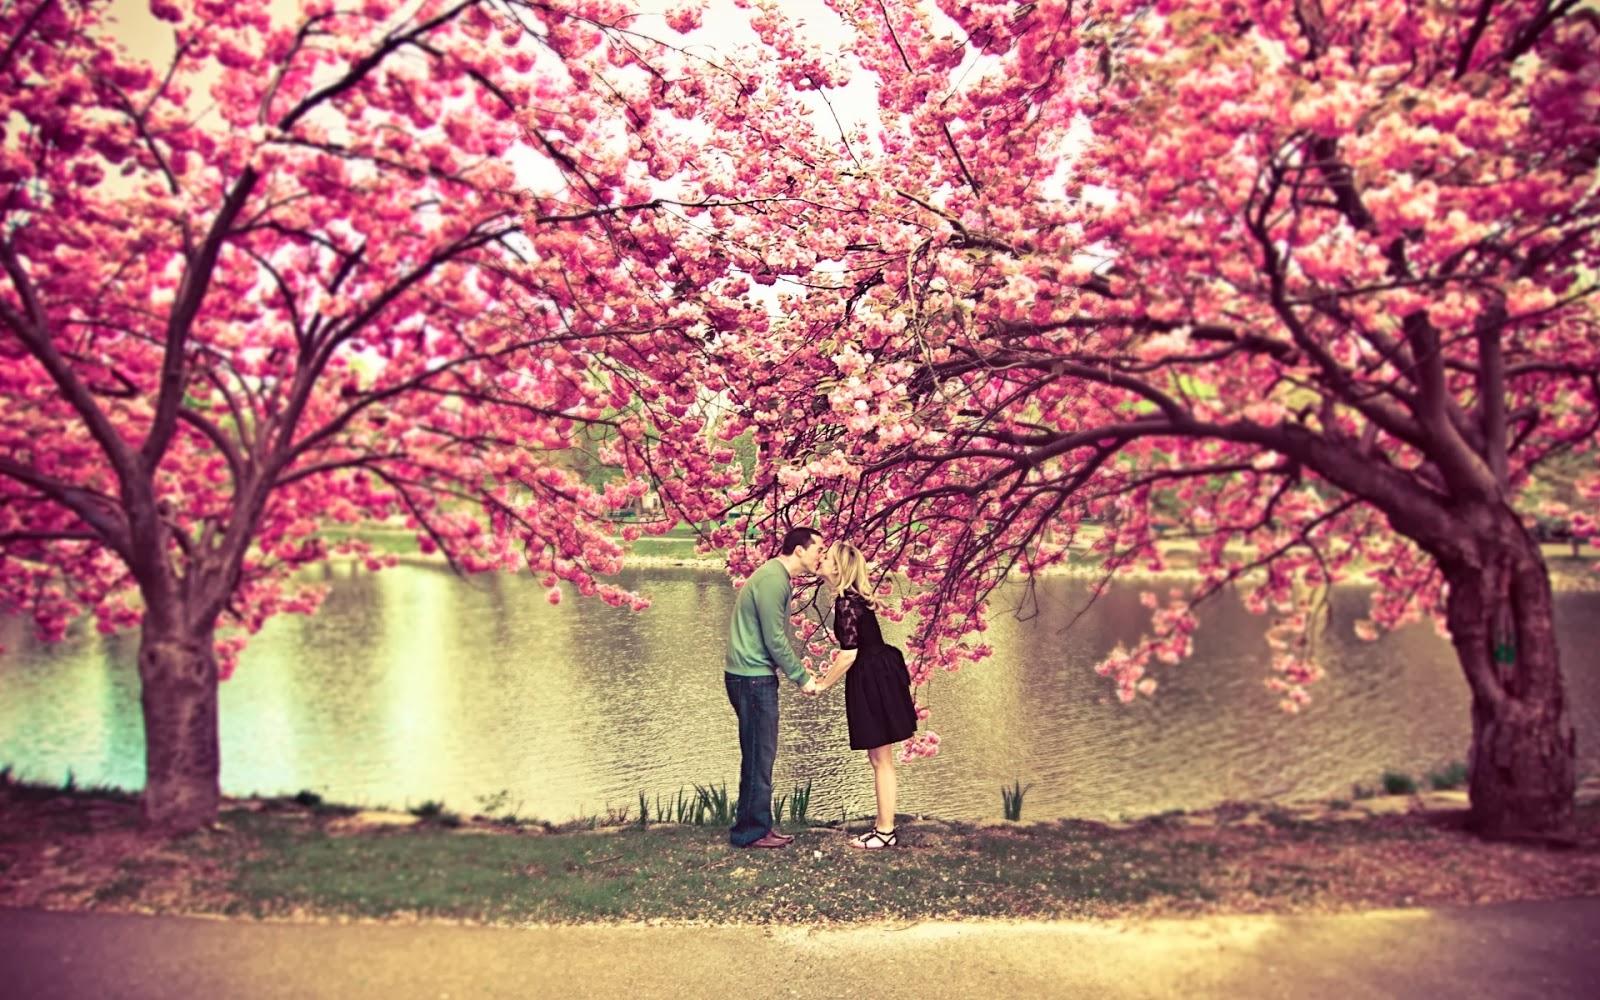 Love-pair-man-kisses-womenat-park-romantic-picture.jpg